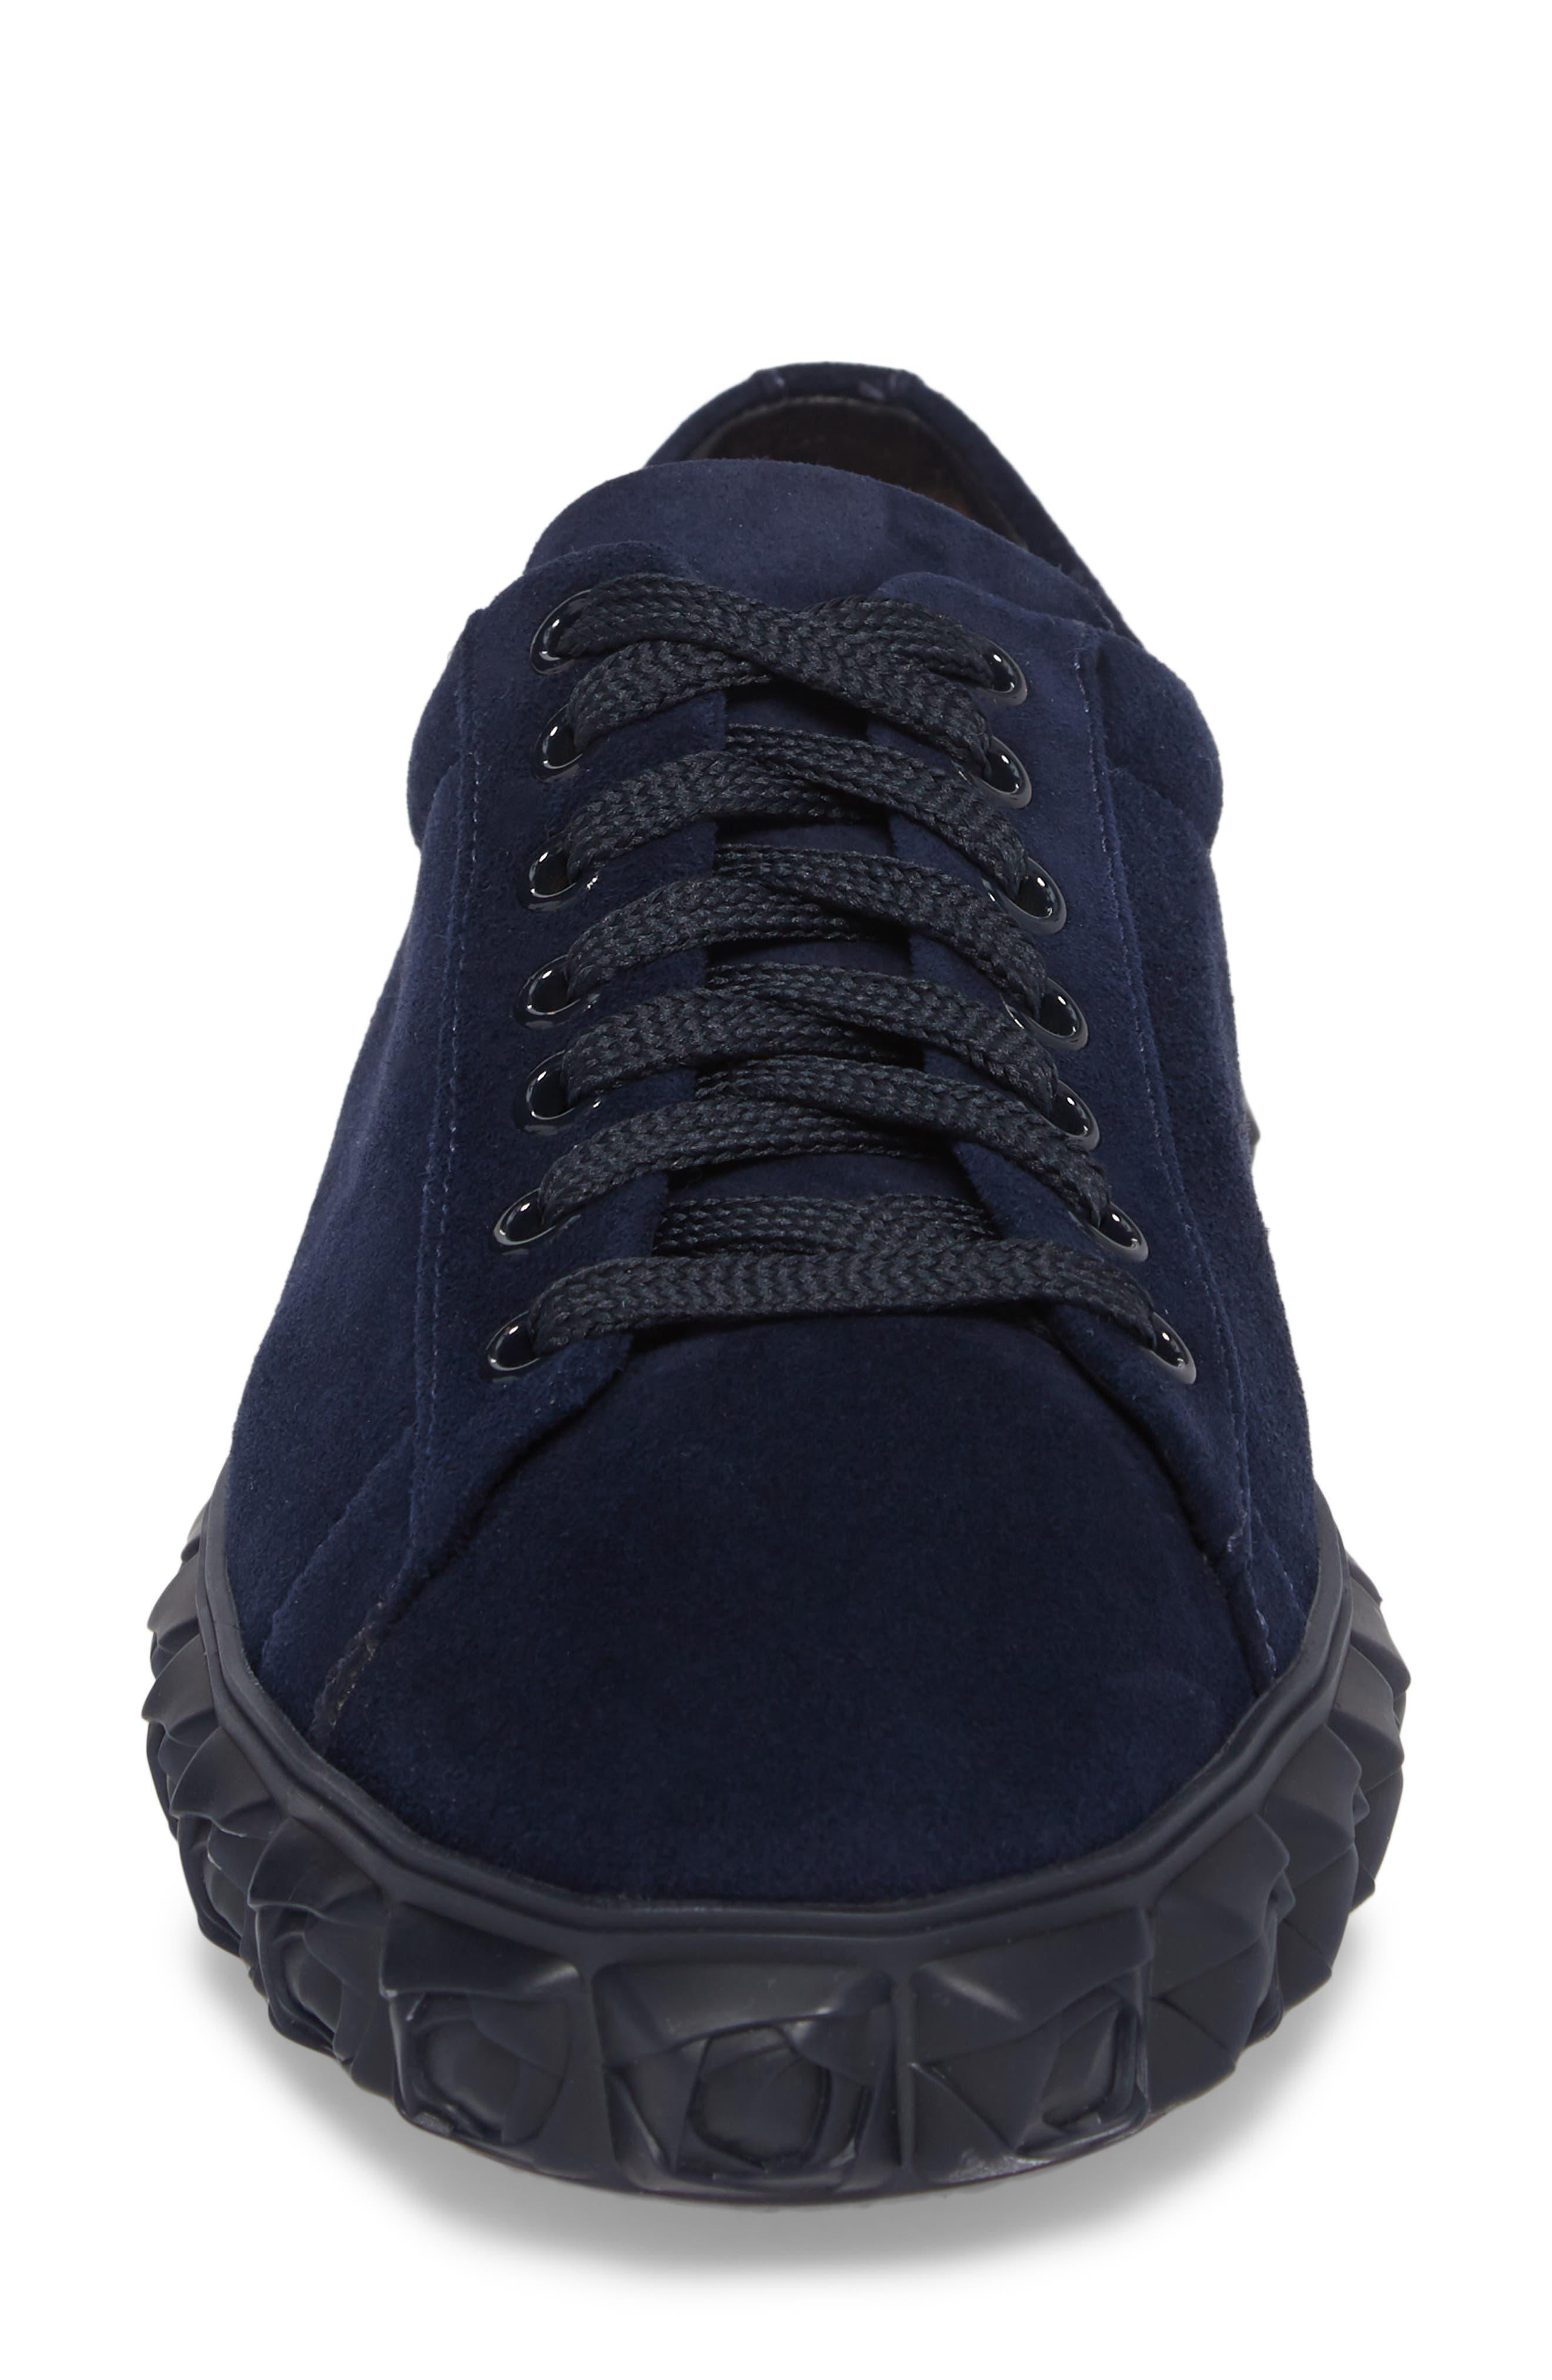 Coverstory Sneaker,                             Alternate thumbnail 4, color,                             400